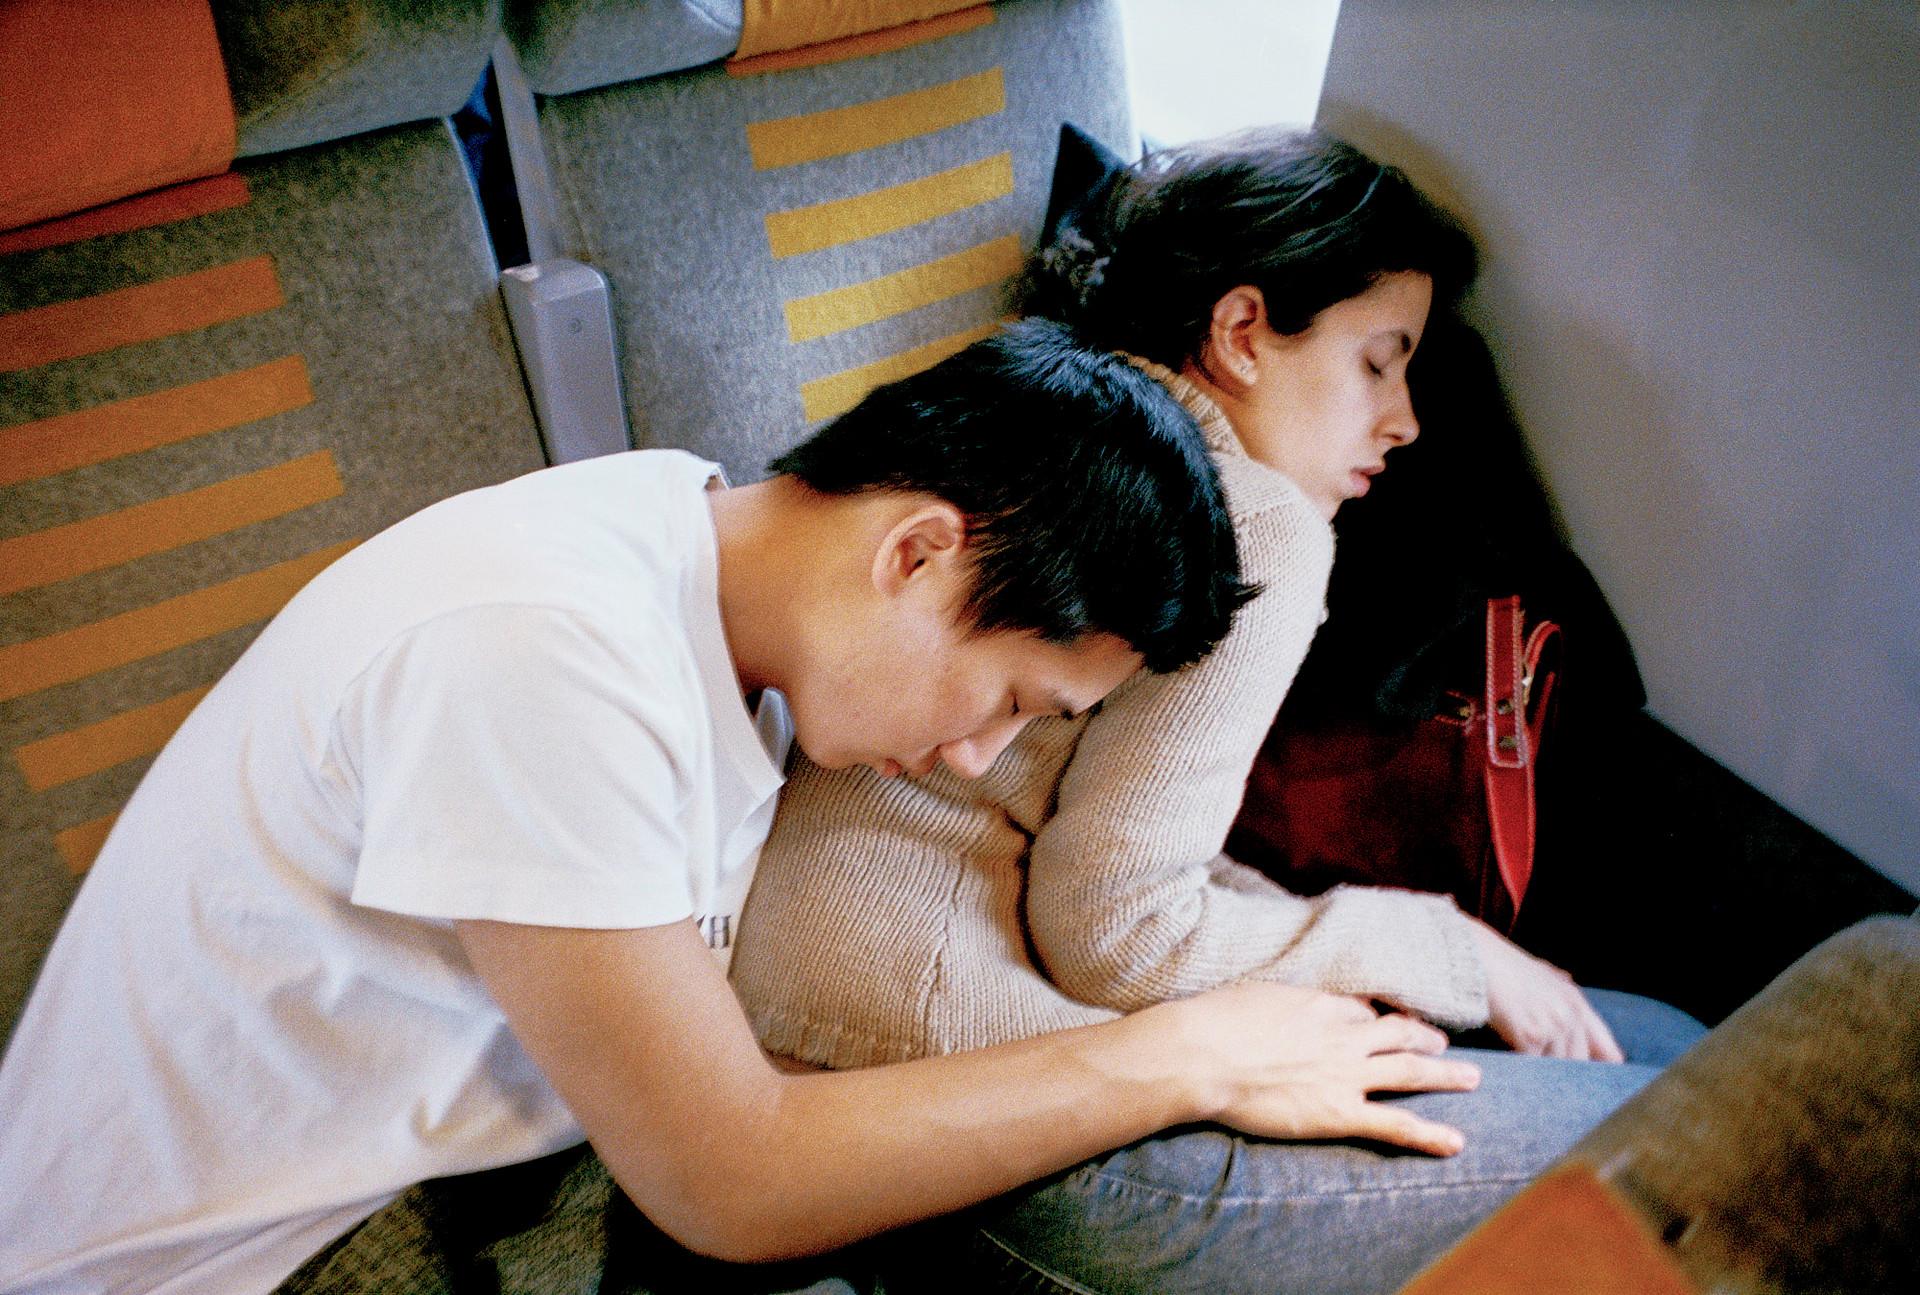 eurostar sleepers #3